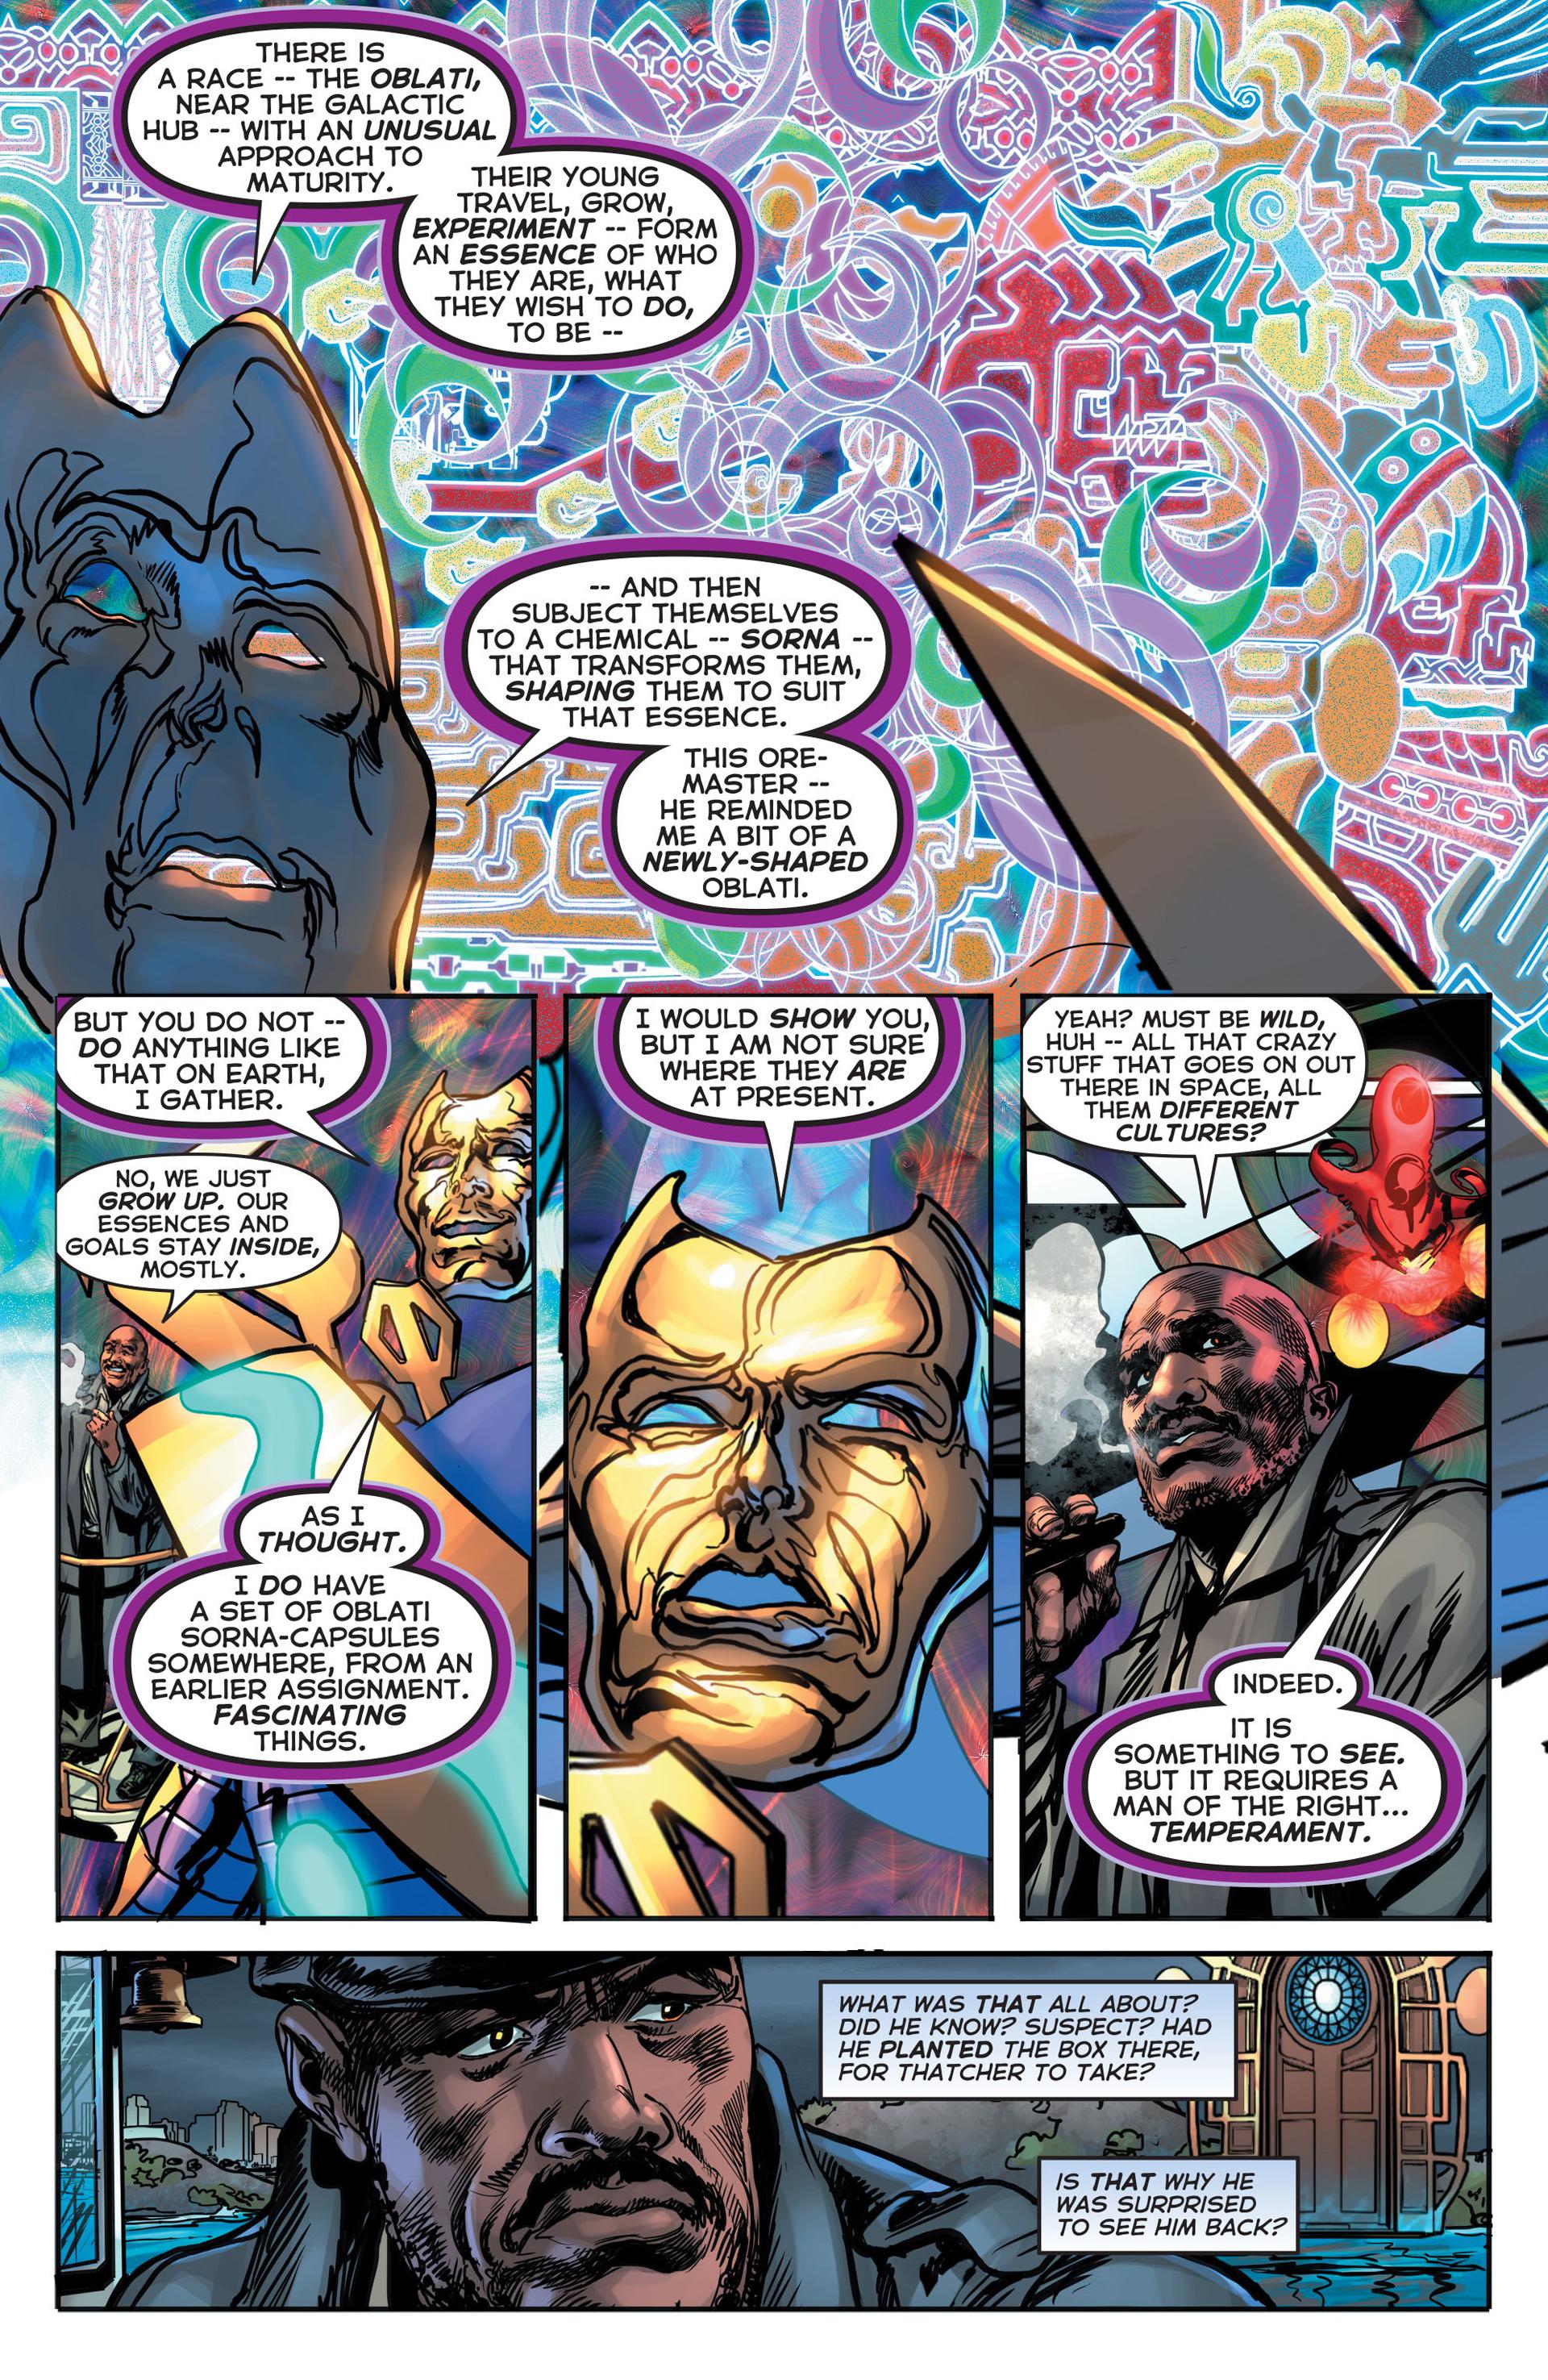 Read online Astro City comic -  Issue #6 - 17